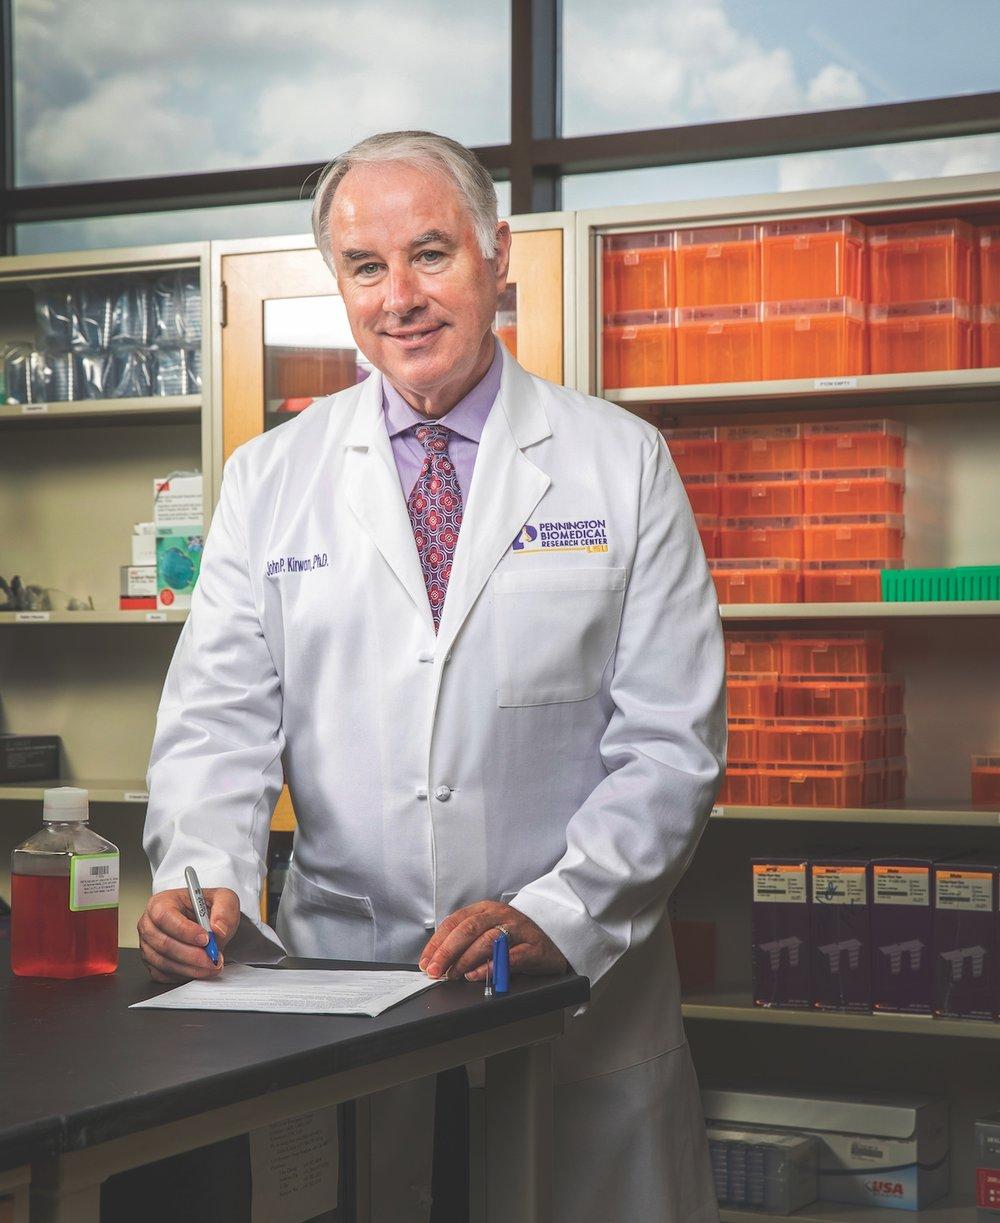 Dr. John Kirwan